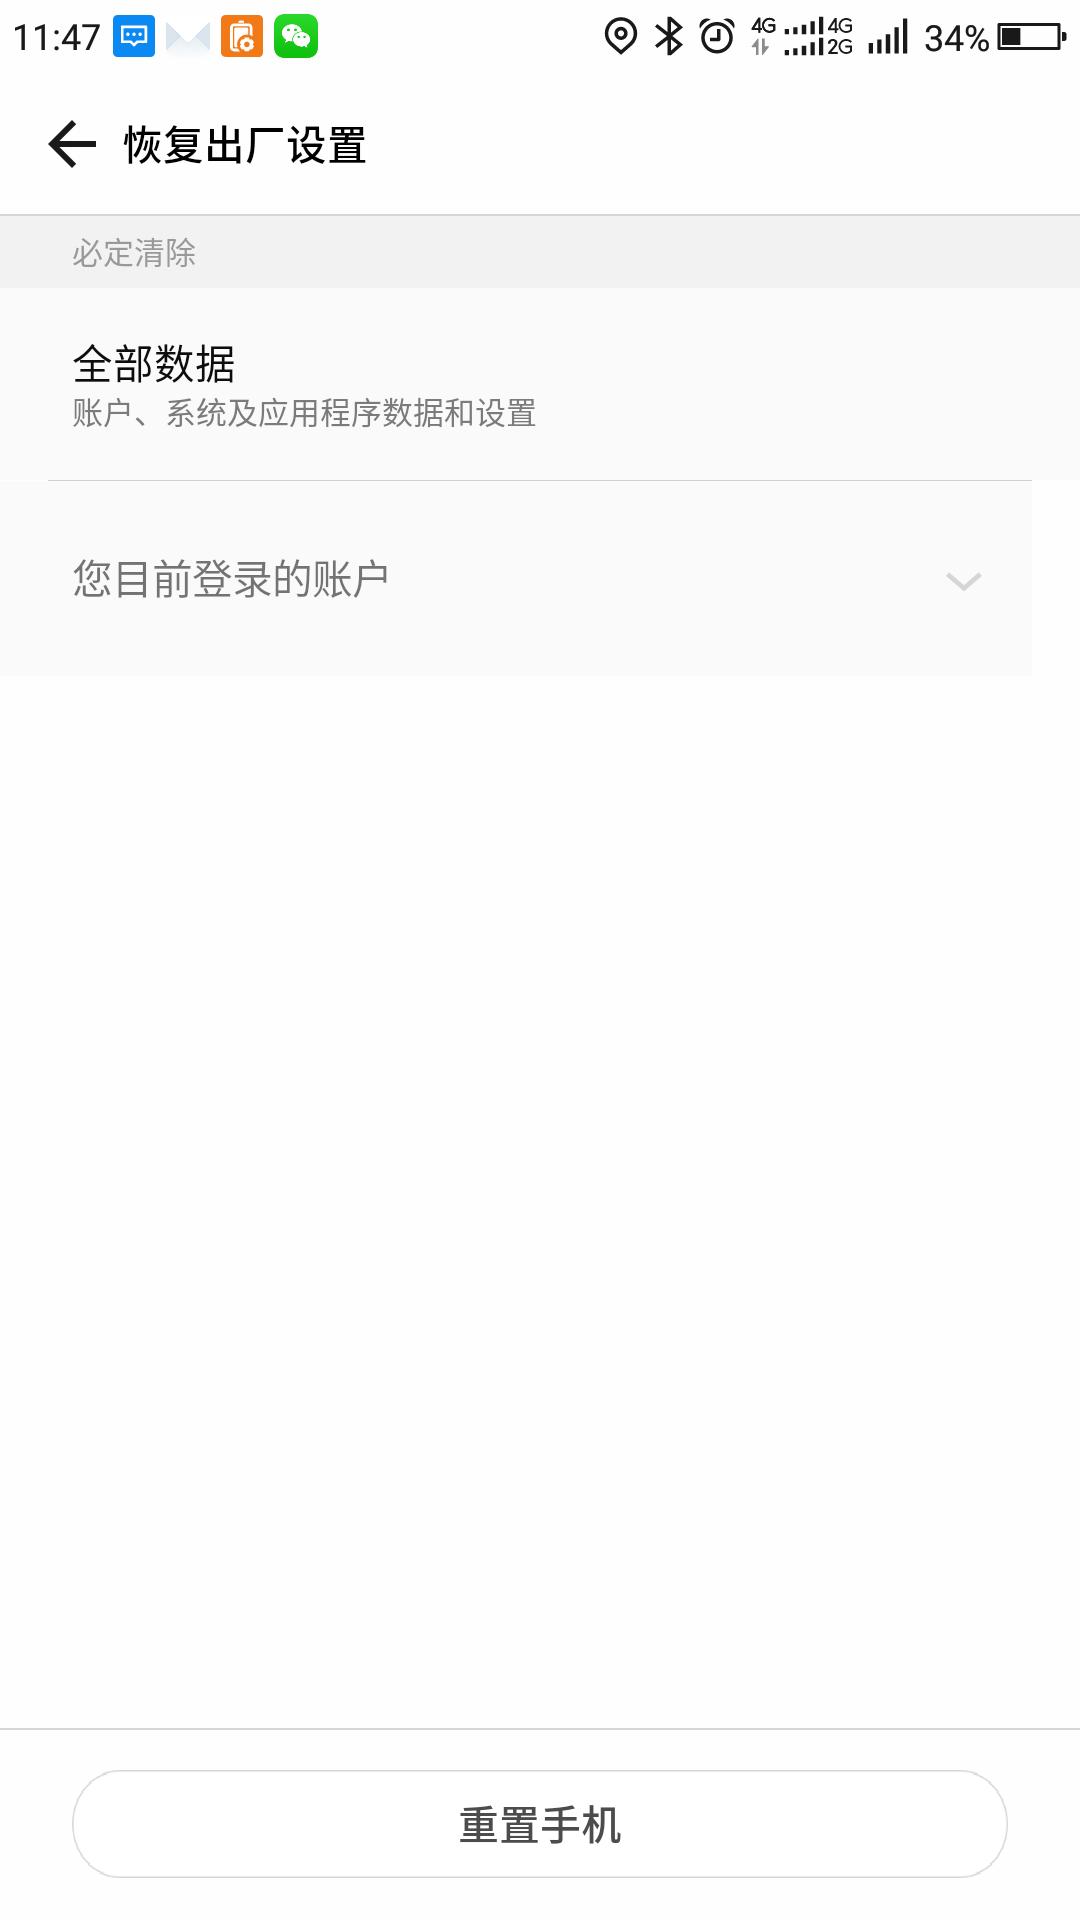 Screenshot_2018-10-26-11-47-39.png